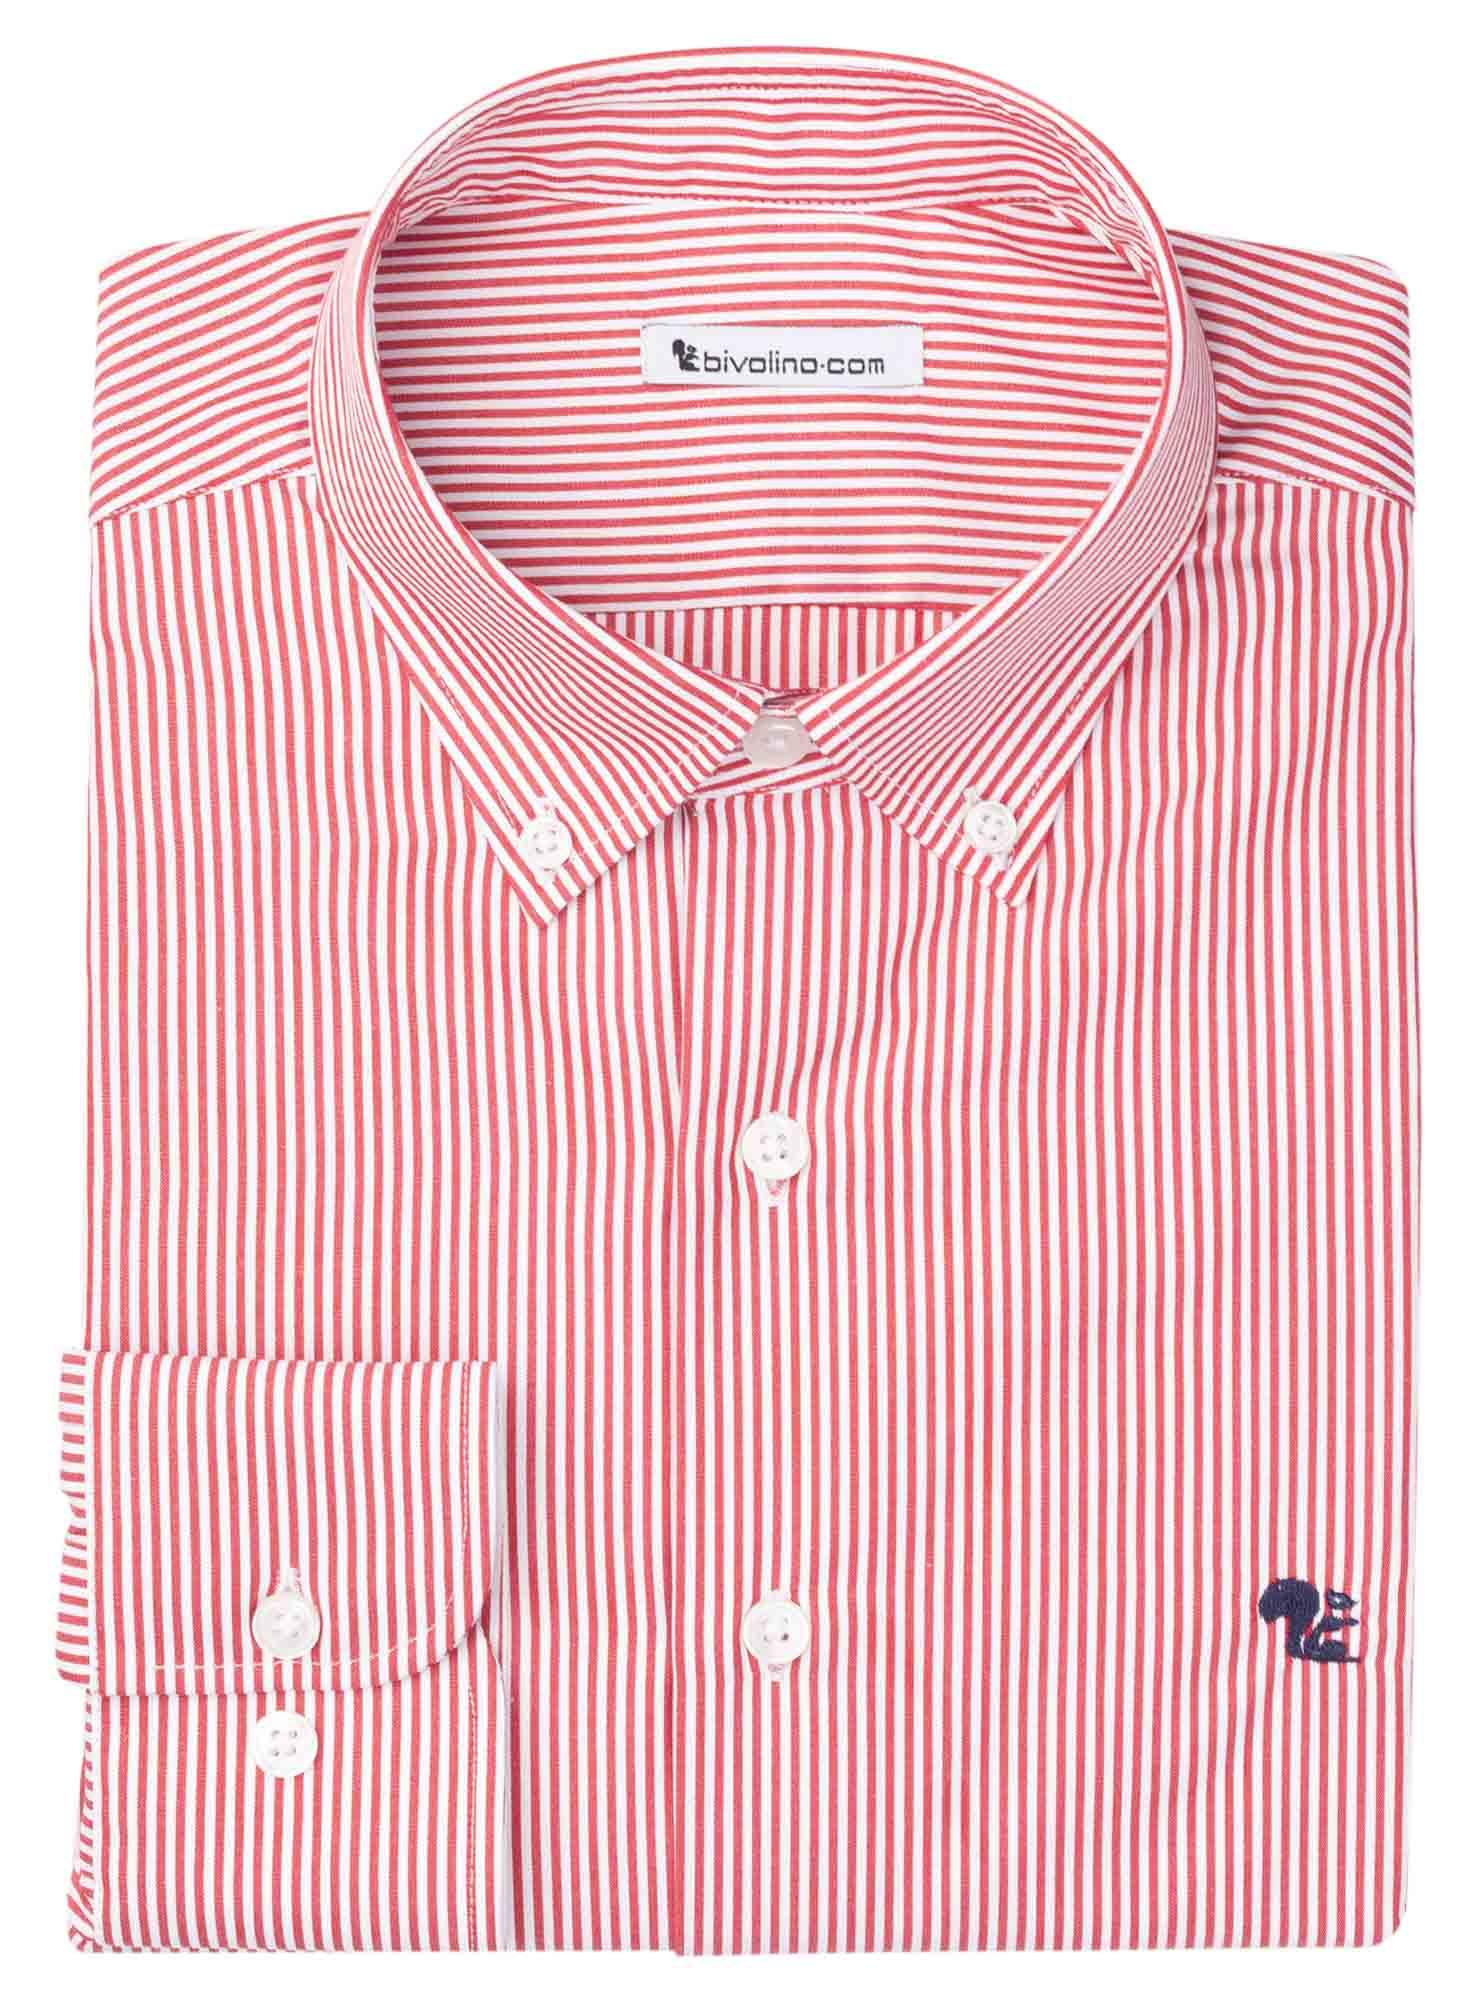 PRATO  - Men's shrt cotton red stripe - FAKIR 8